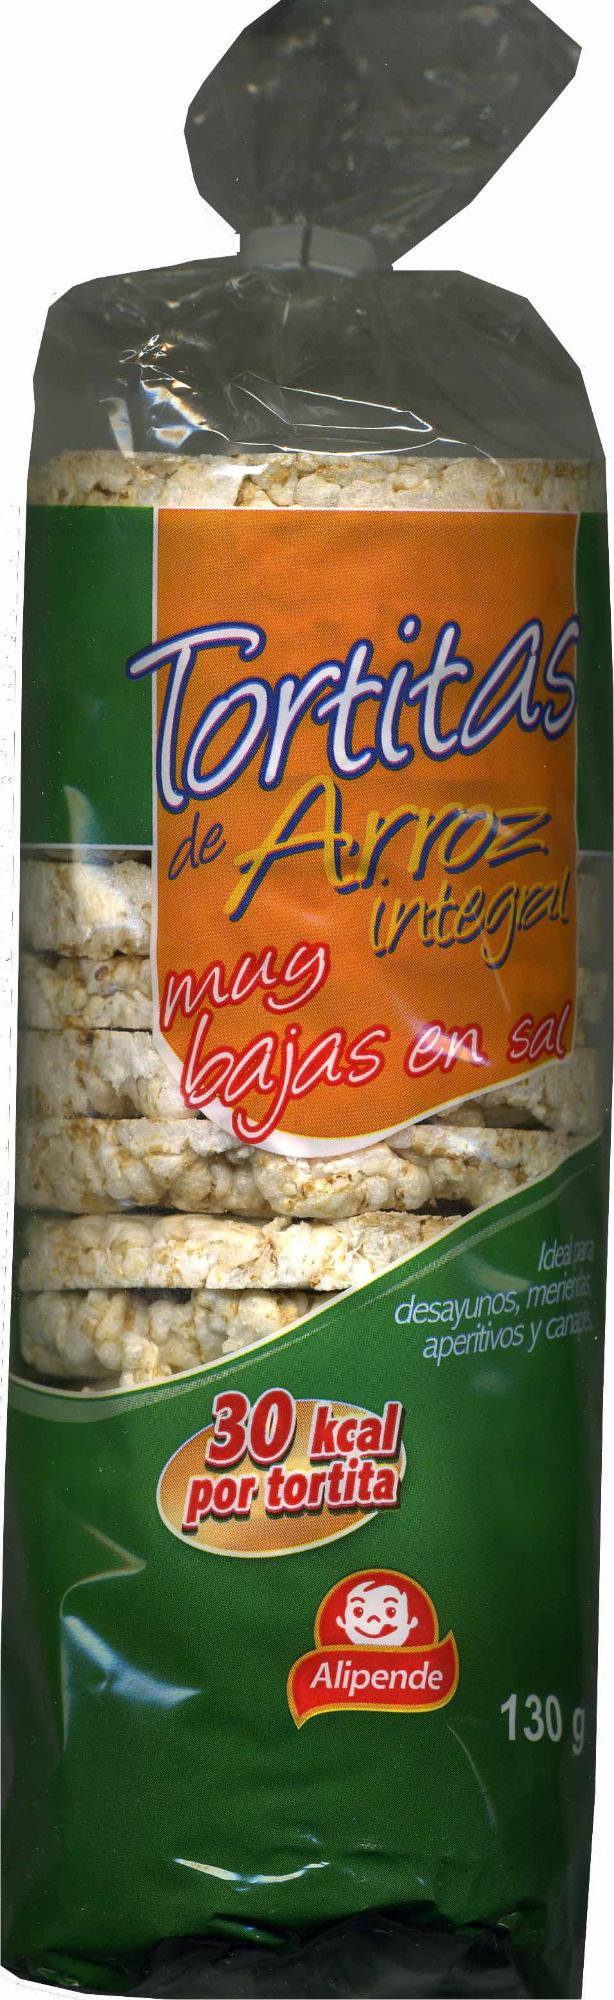 Tortitas de arroz integral bajas en sal - Produit